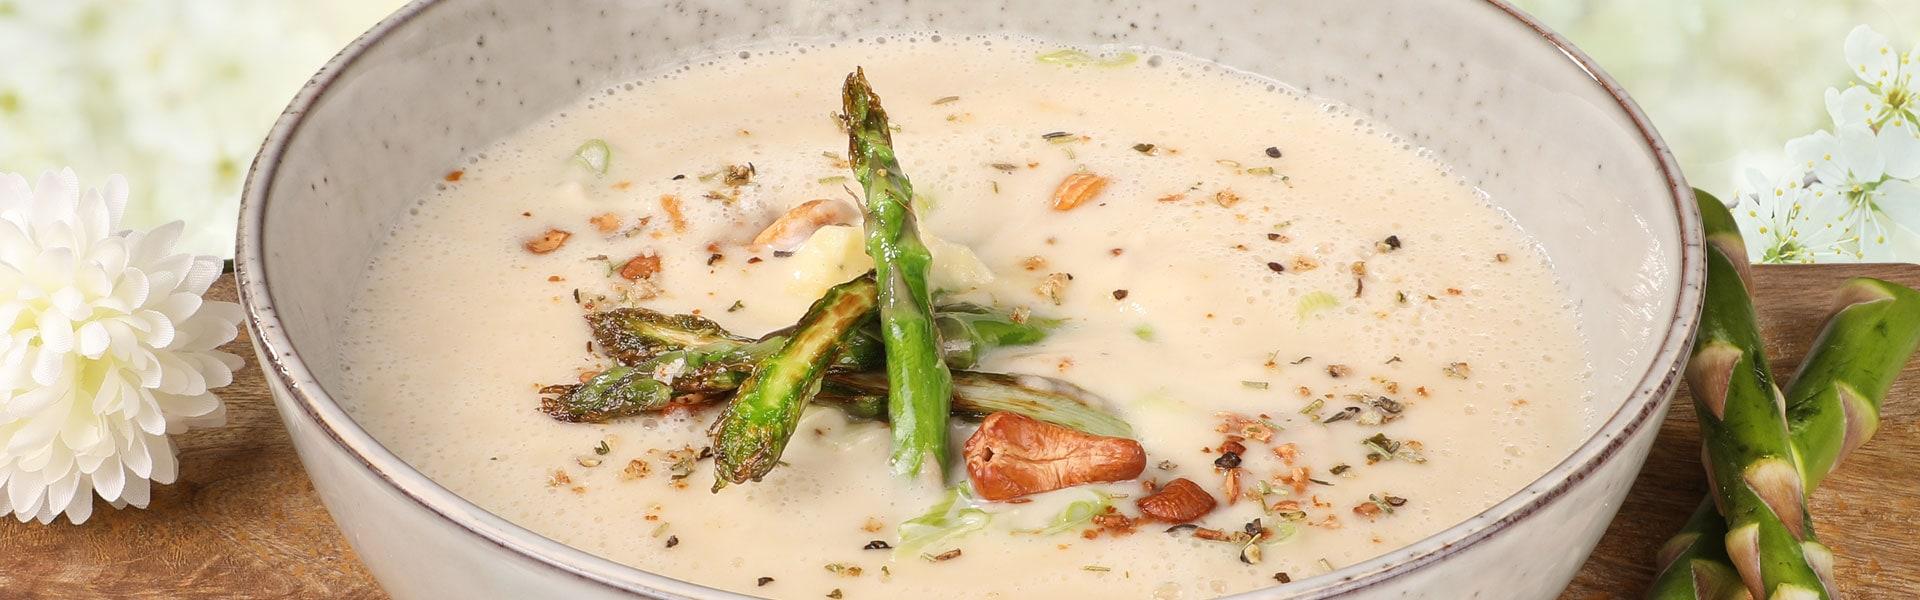 Cremesuppe vom Spargel – Hollands Gourmet Service Osterrezepte